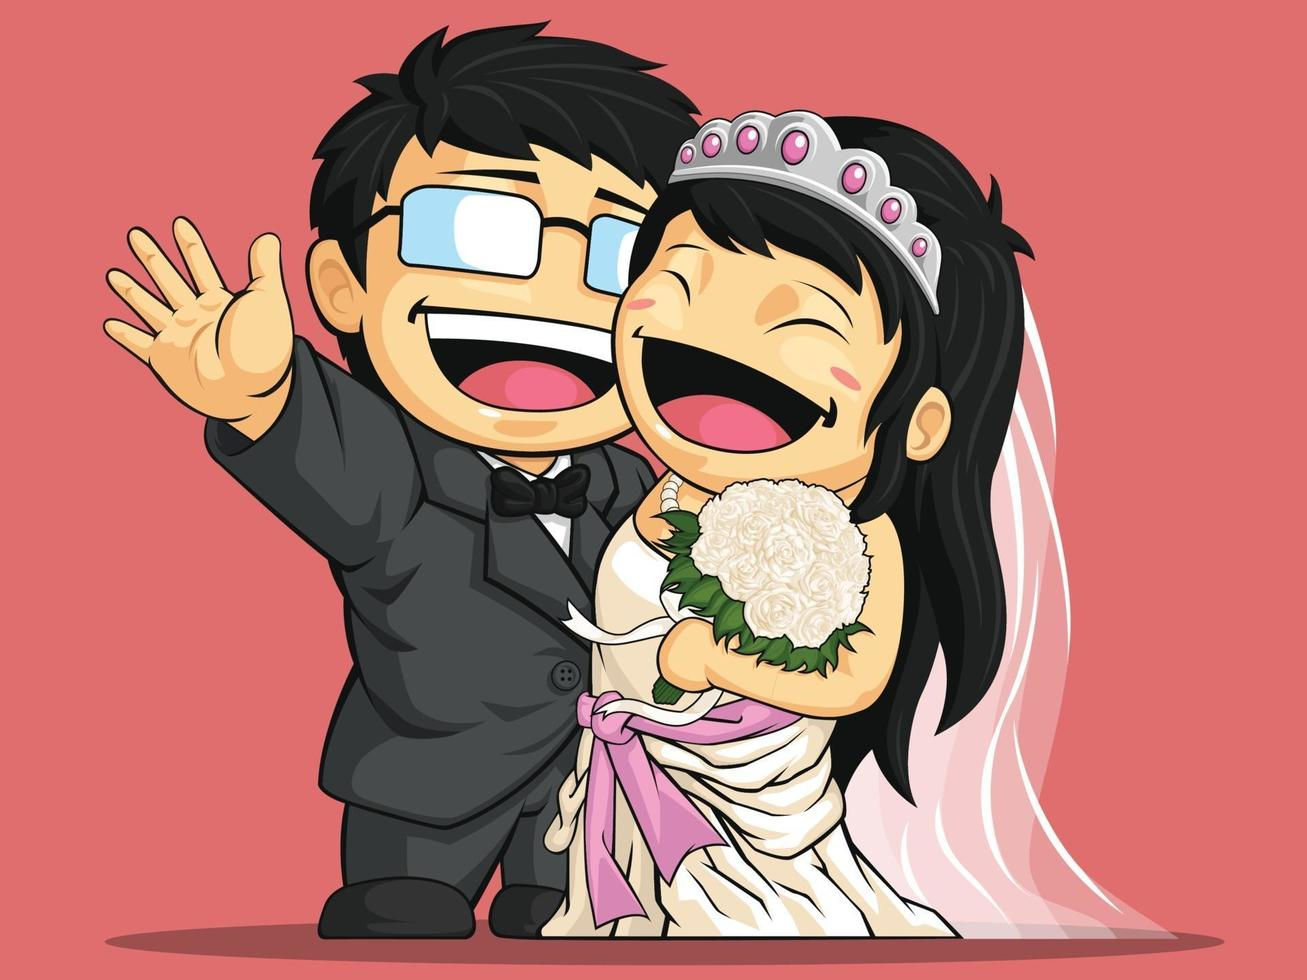 Happy Wedding Bride Groom Couple Engagement Cartoon Illustration vector